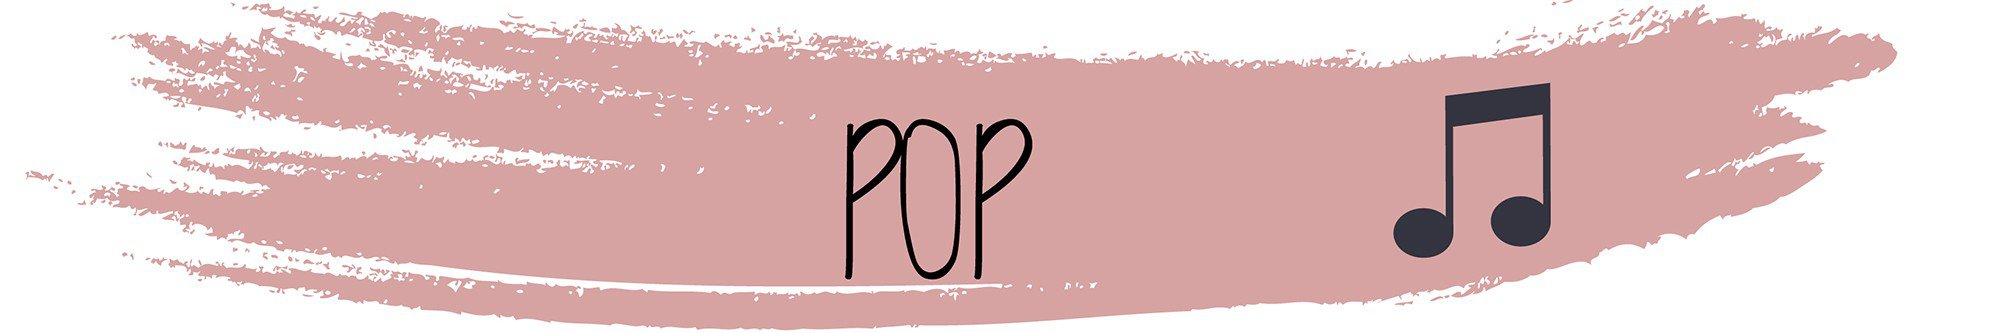 POP_Prancheta 1